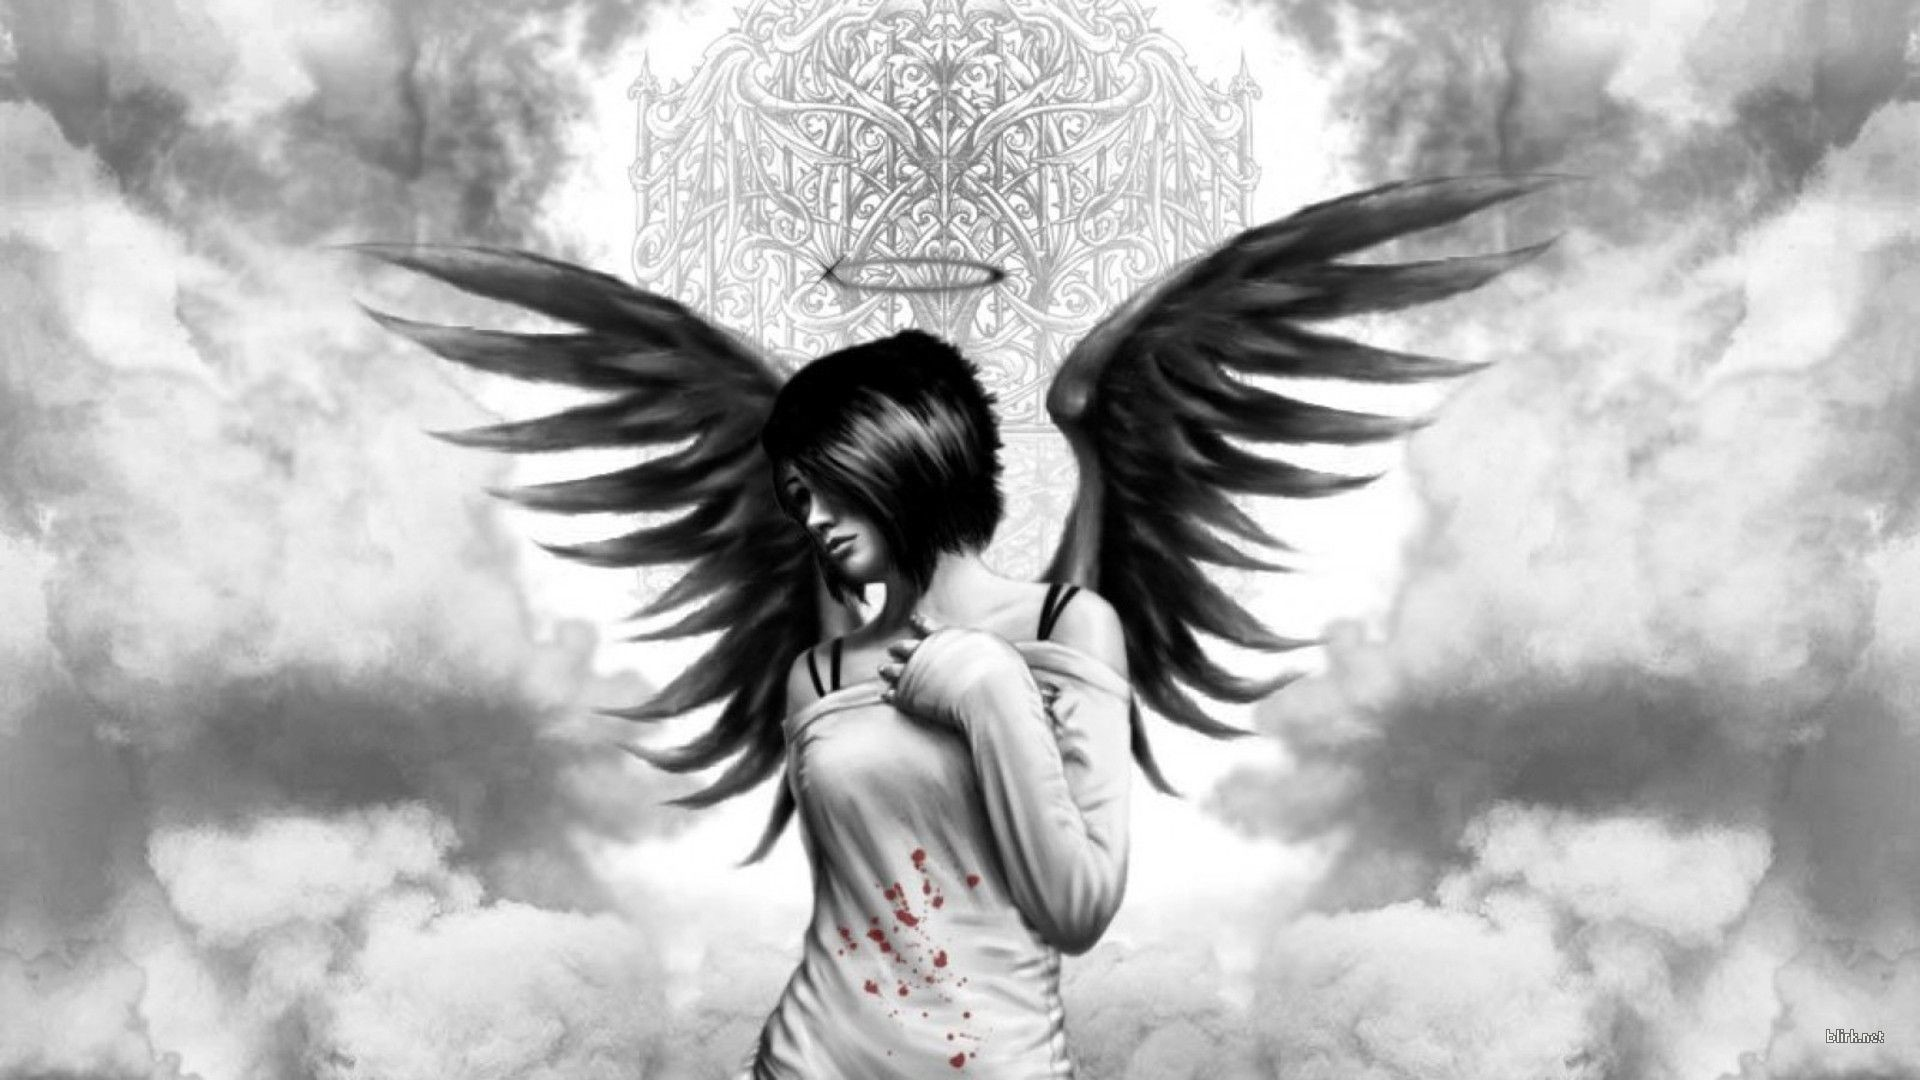 Online Buy Wholesale dark angel wallpaper from China dark angel Dark Angel  Backgrounds Wallpapers)